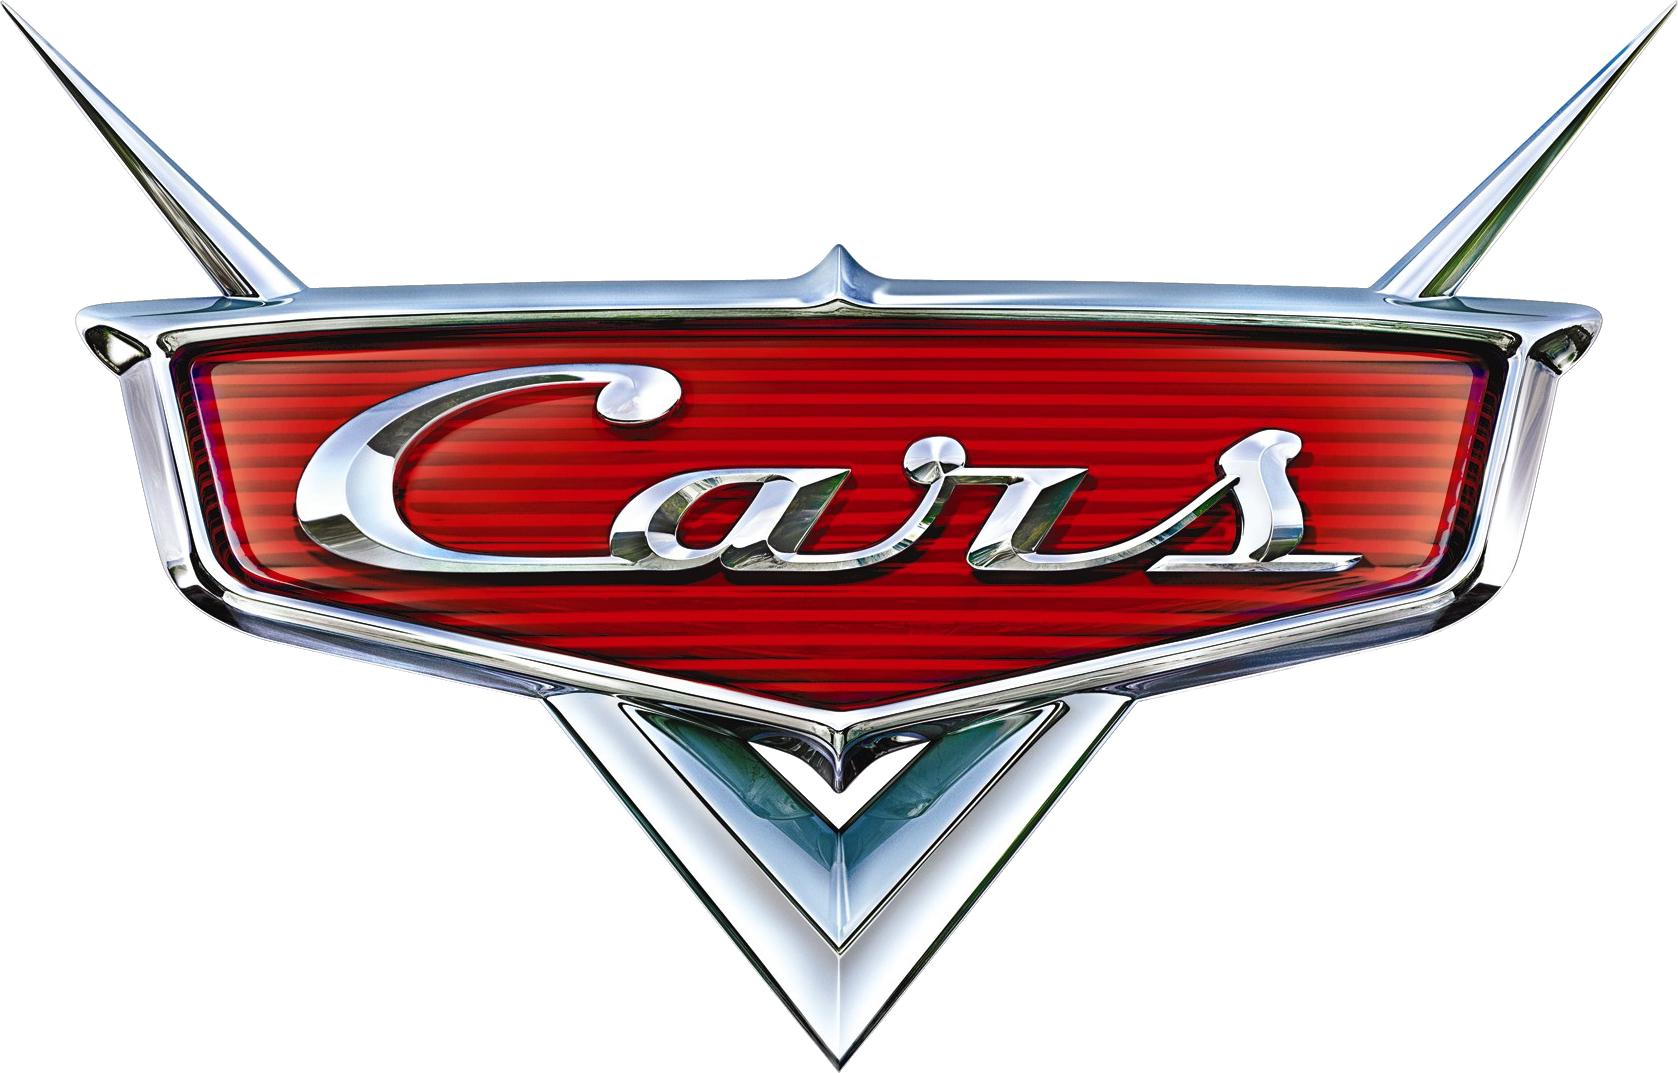 Disneyland clipart emblem. Cars crossover wiki fandom